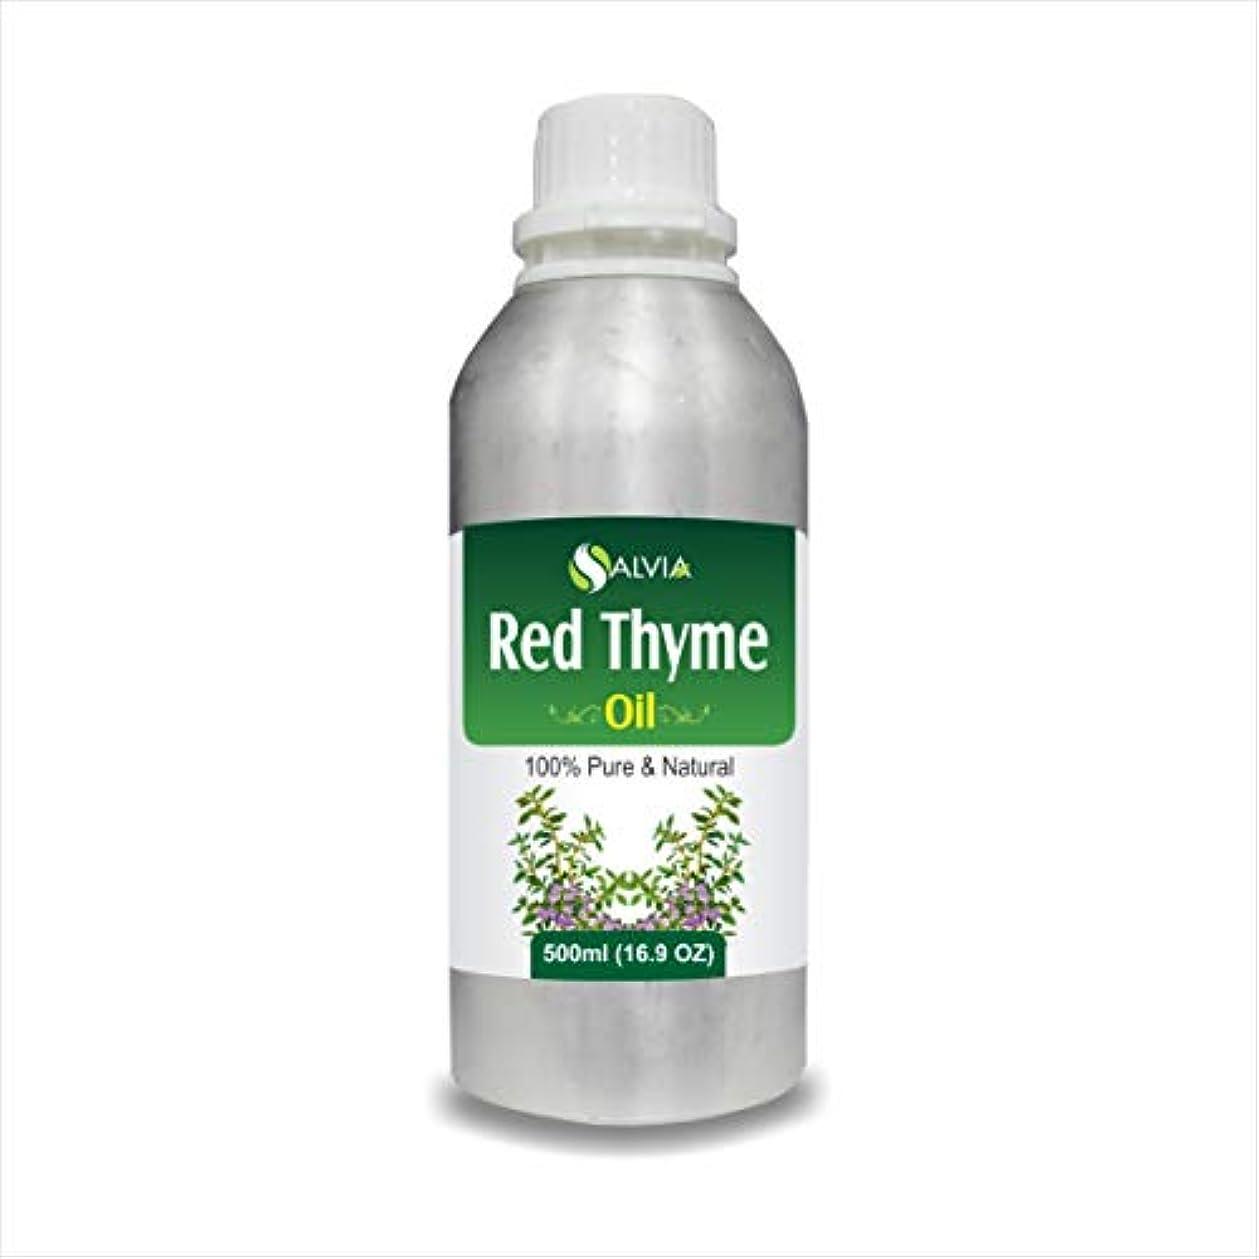 RED Thyme Oil (Thymus VULGARIS) 100% Natural Pure Essential Oil (500ml)